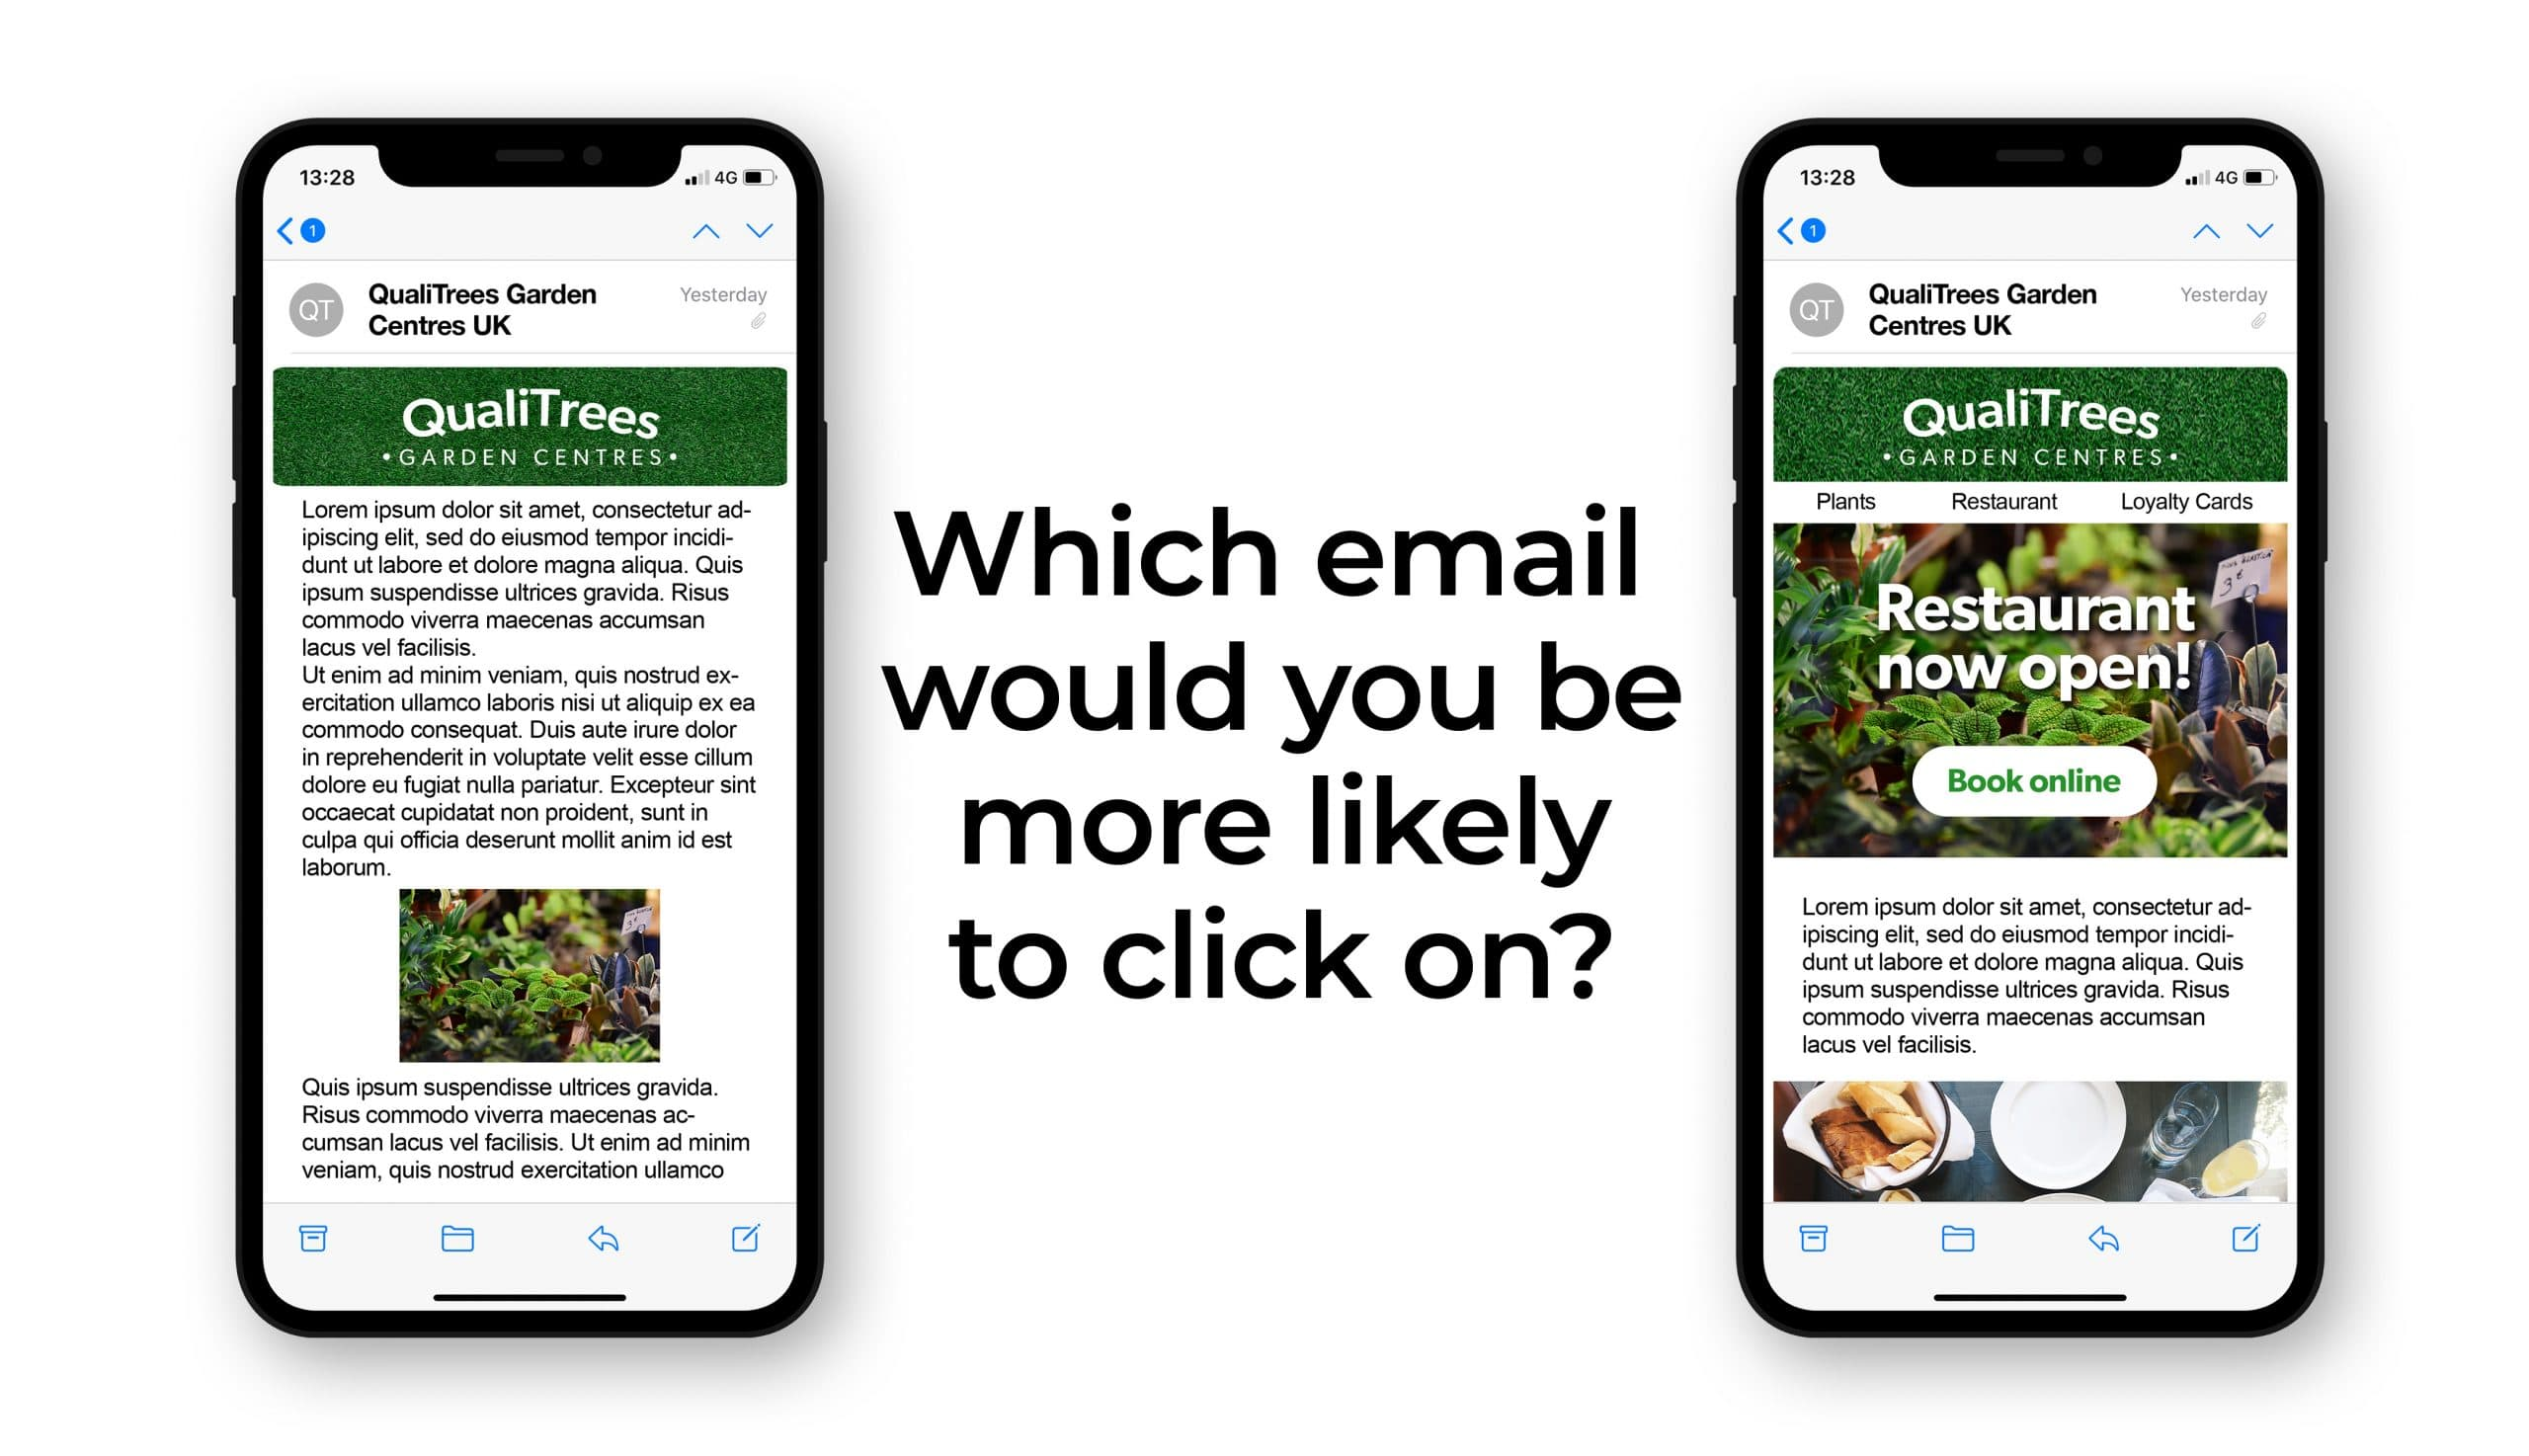 Email comparison